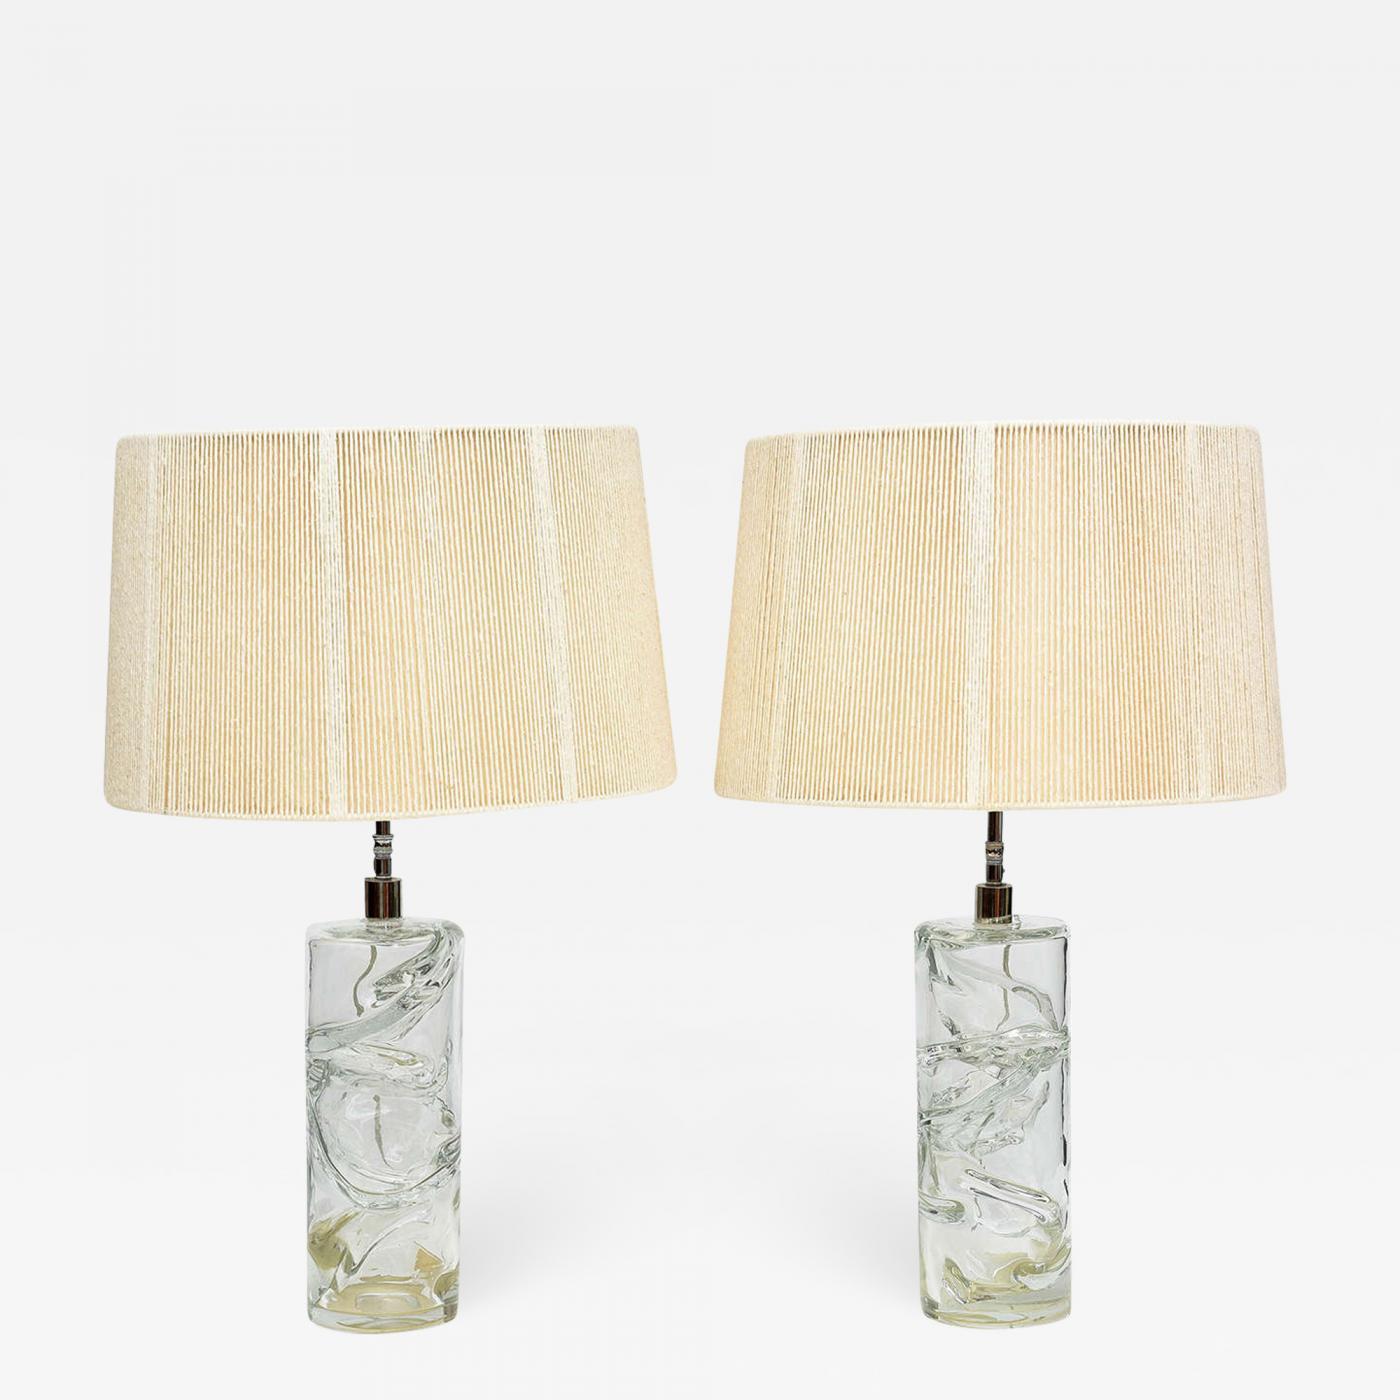 Pair Italian Modern Hand Blown Glass Table Lamps Murano 1950s